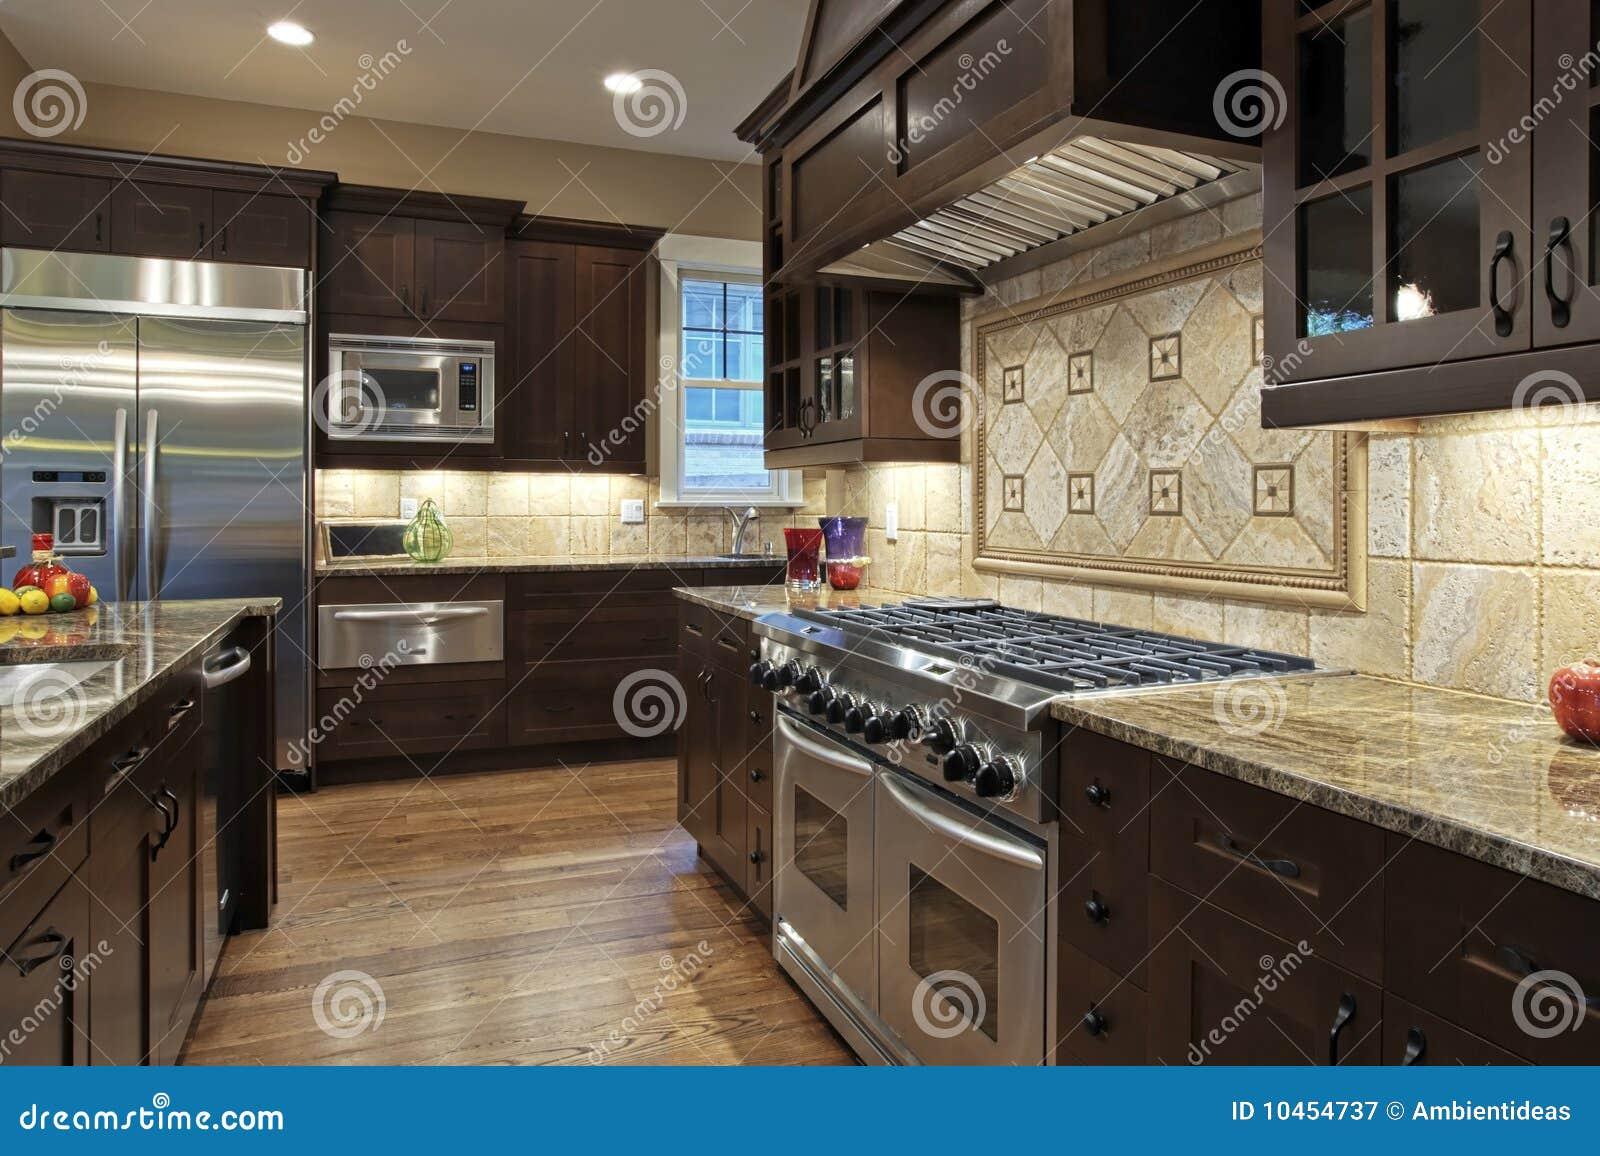 Luxe de cuisine image stock image du patrimoine for Cuisine de luxe